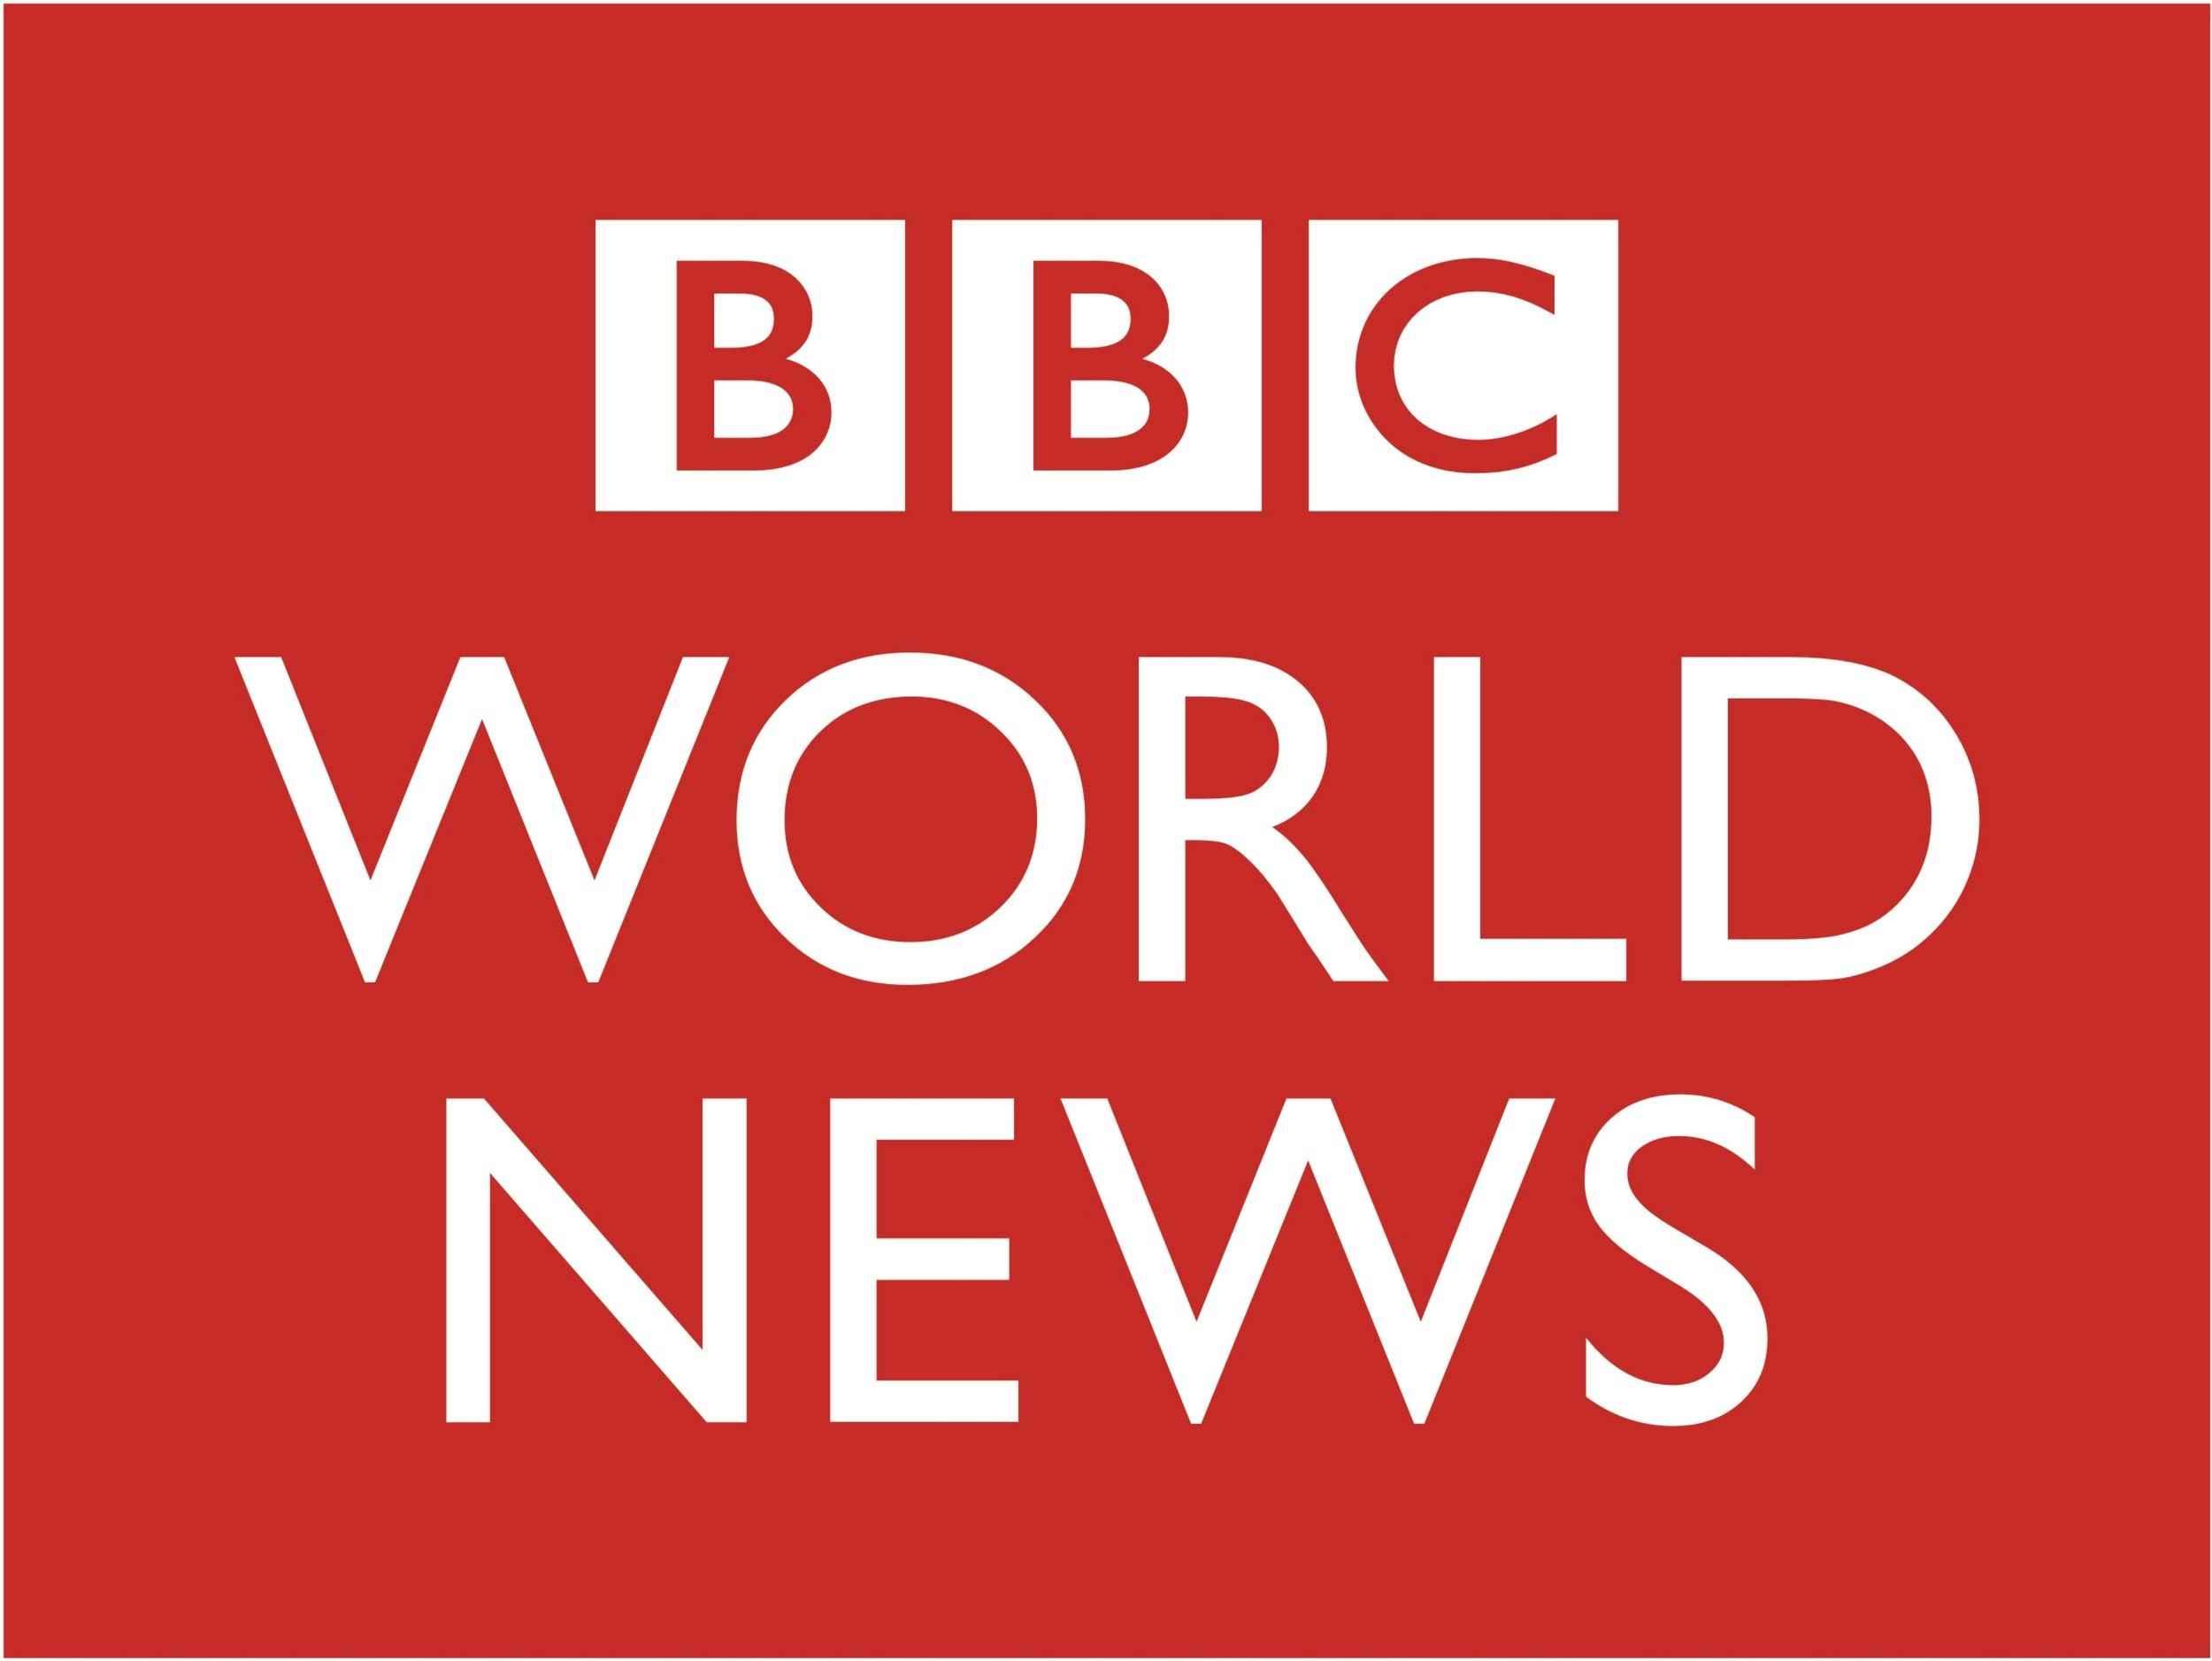 bbc world news logo vector